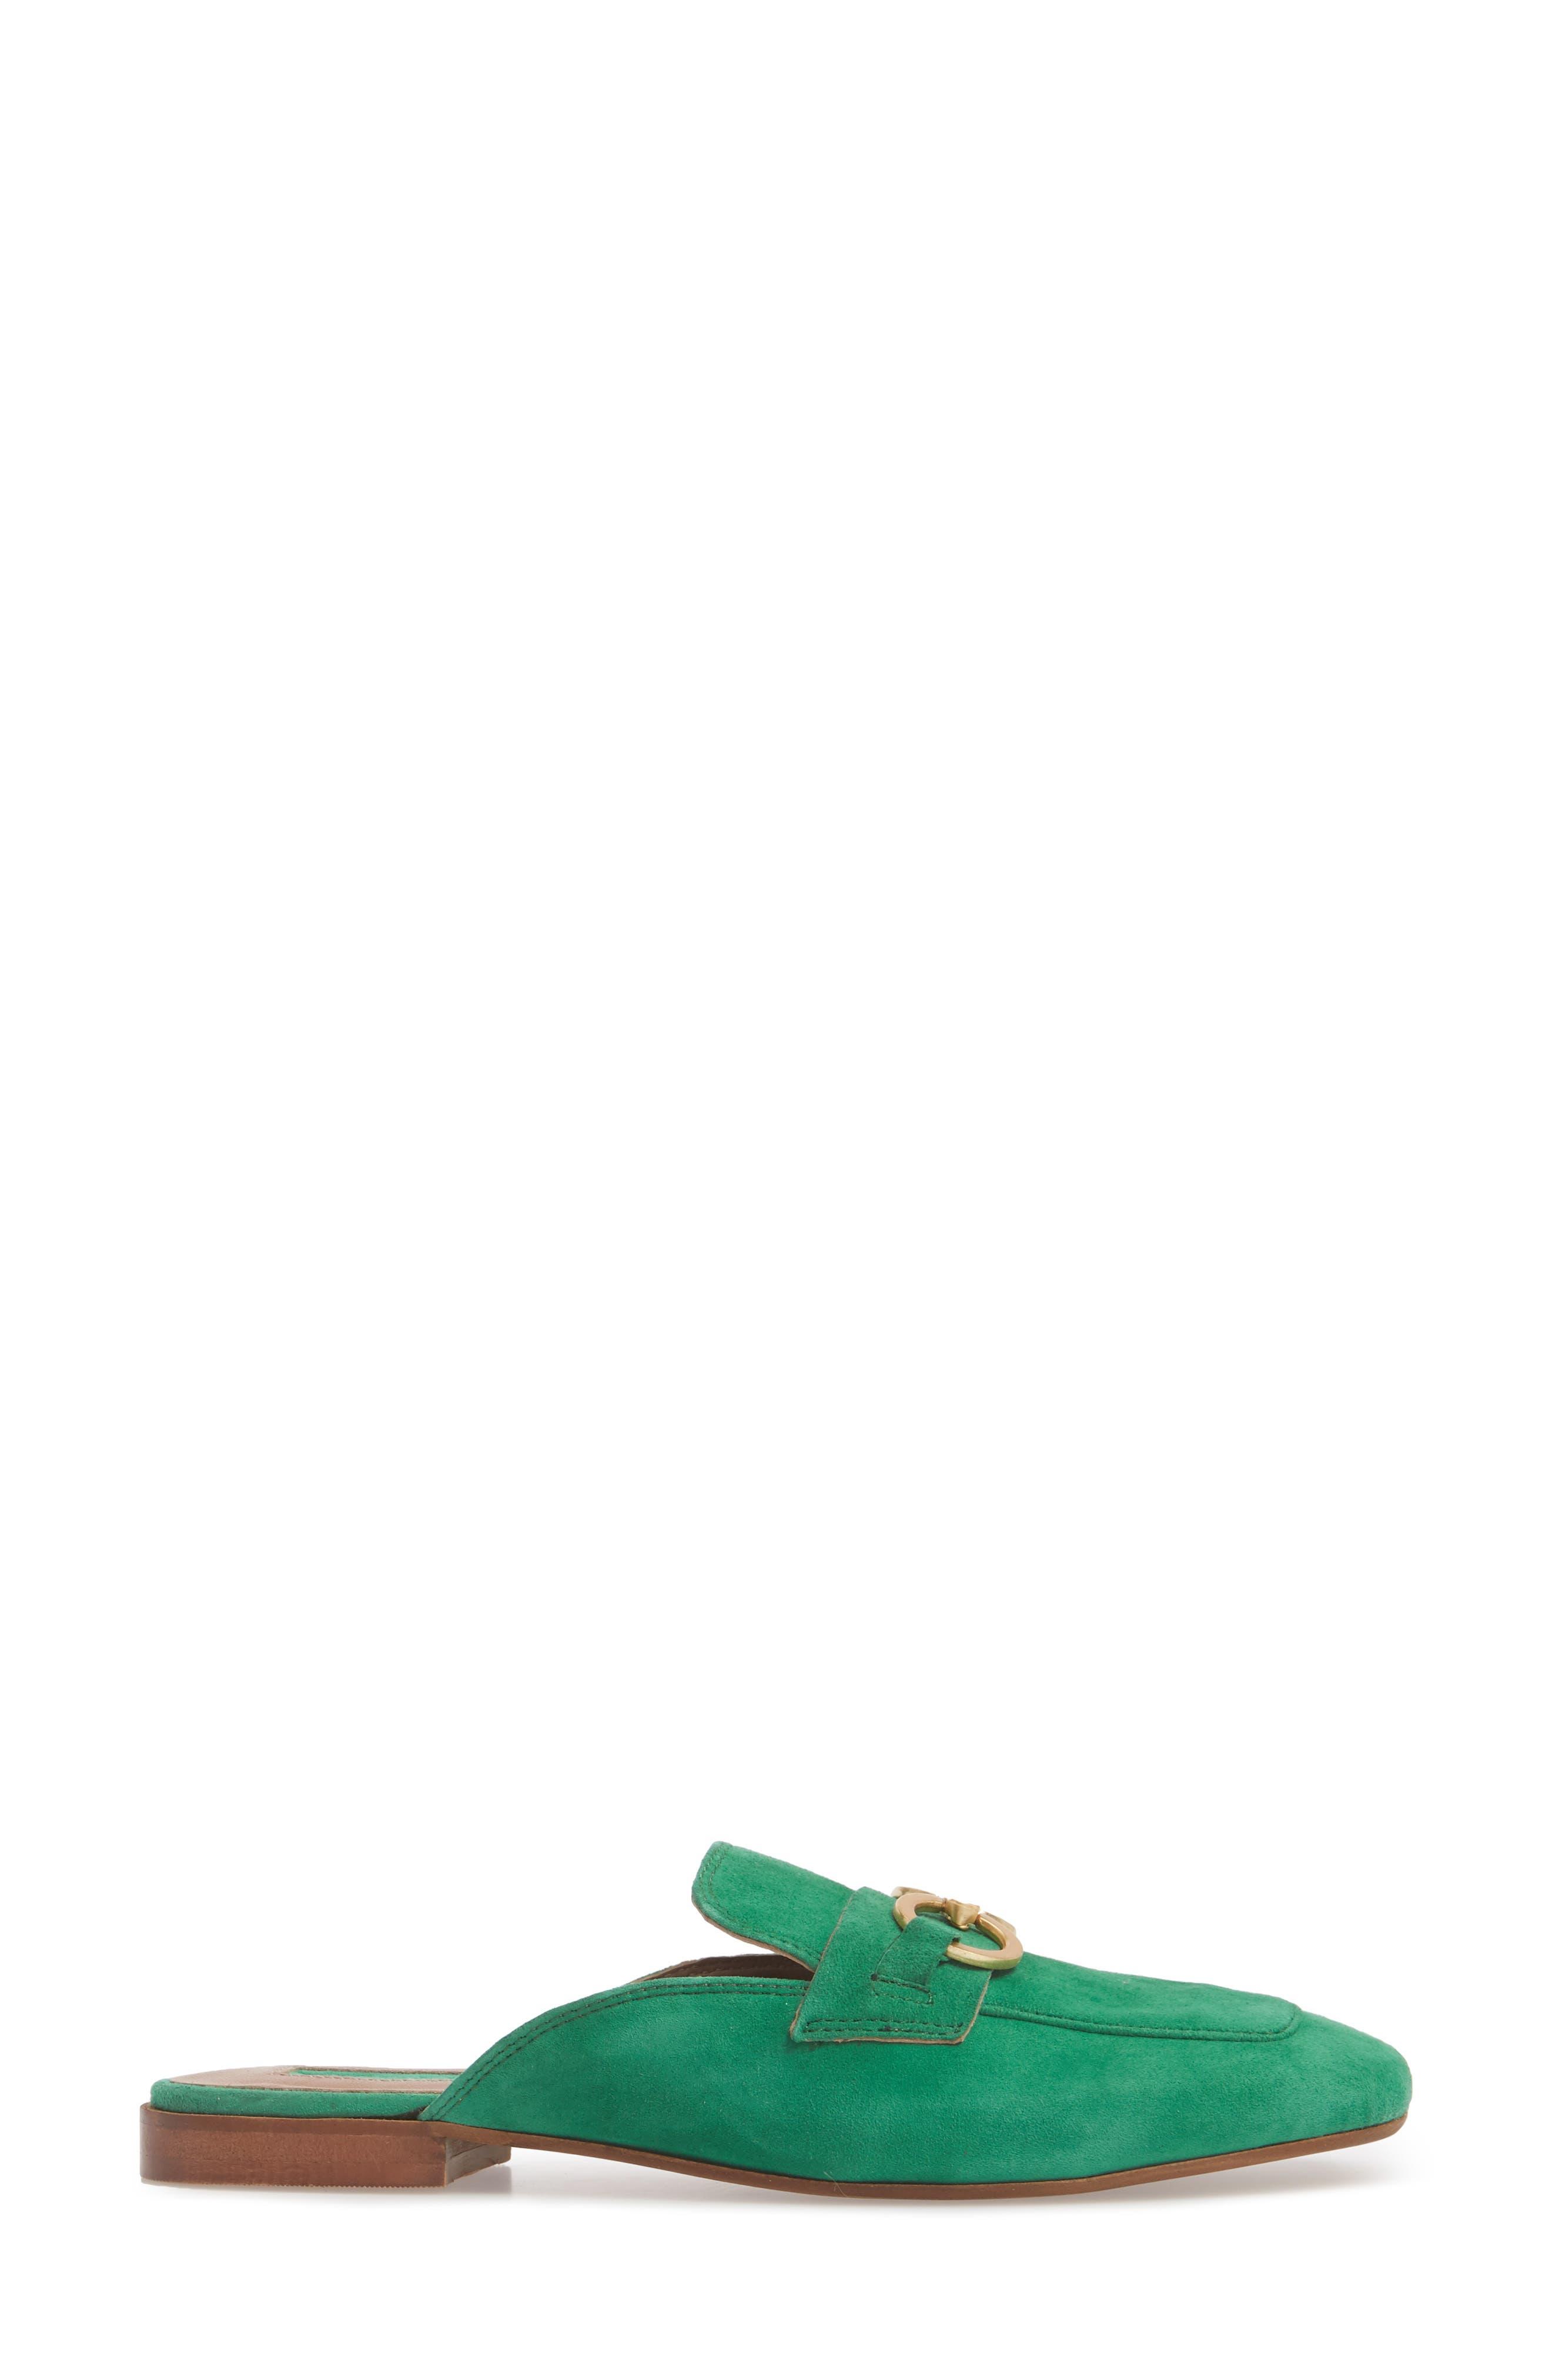 Kale Trim Loafer Mule,                             Alternate thumbnail 3, color,                             Green Multi